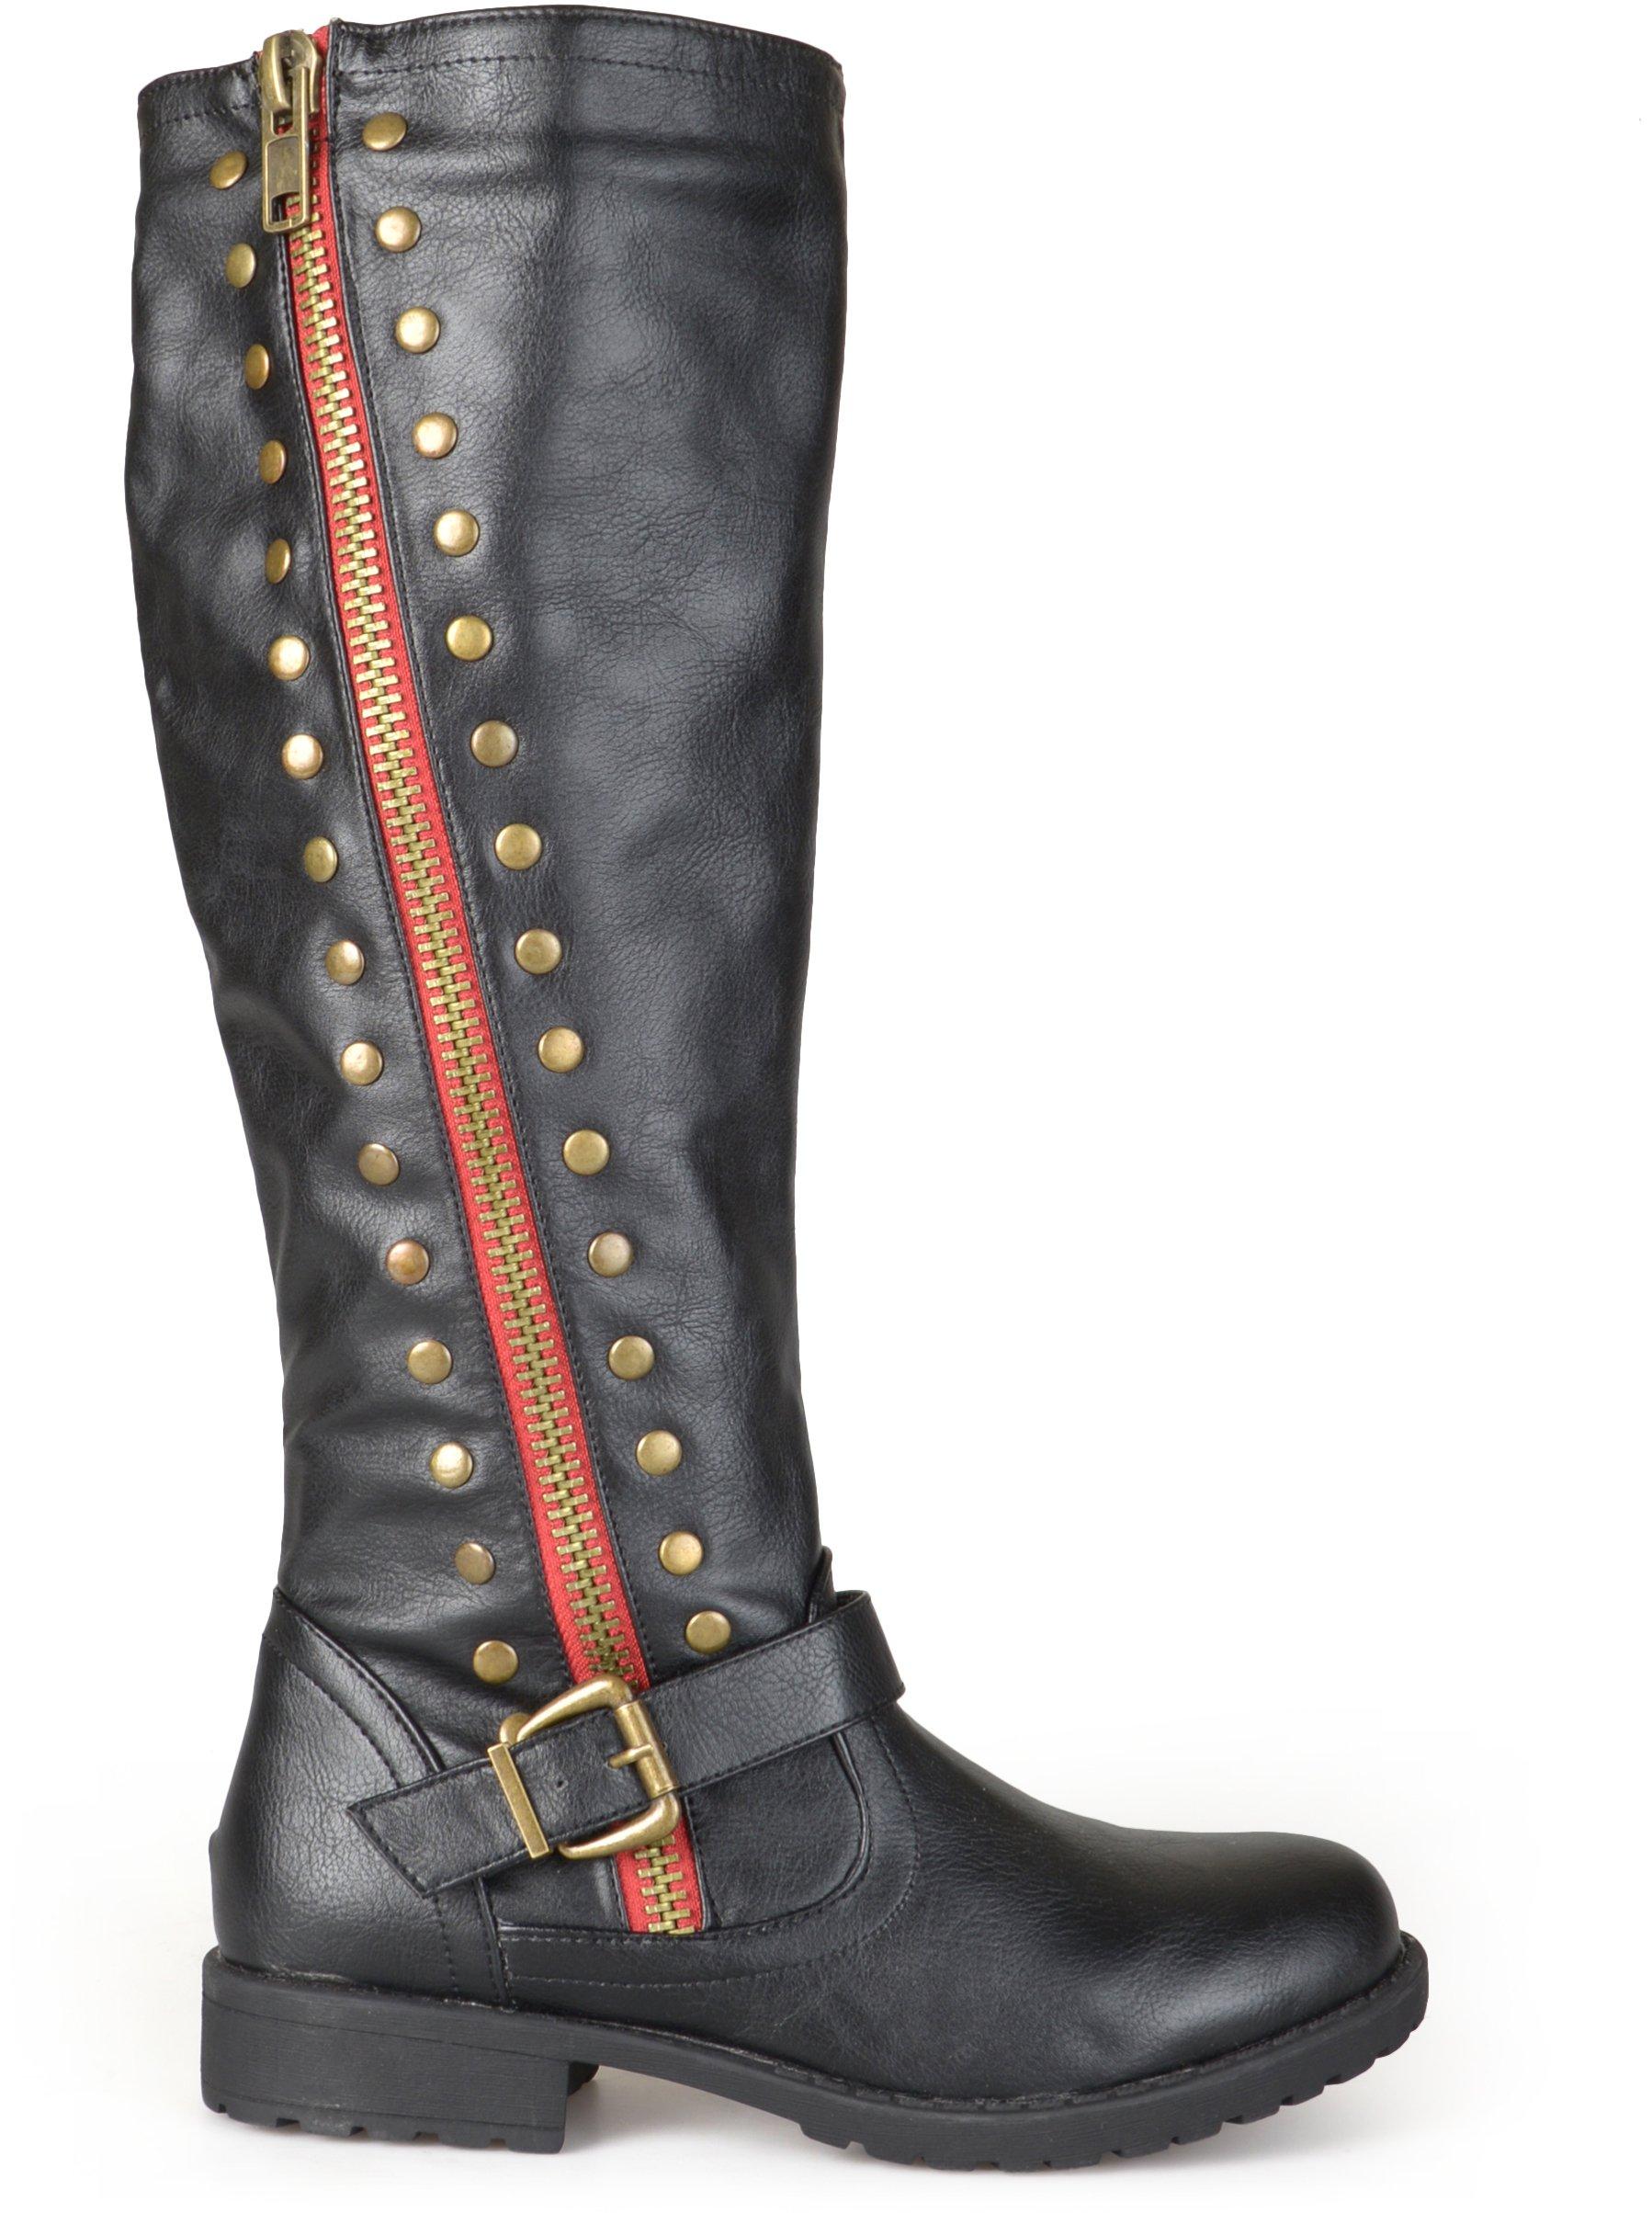 Brinley Co Women's Whirl Knee High Boot, Black, 8 Regular US